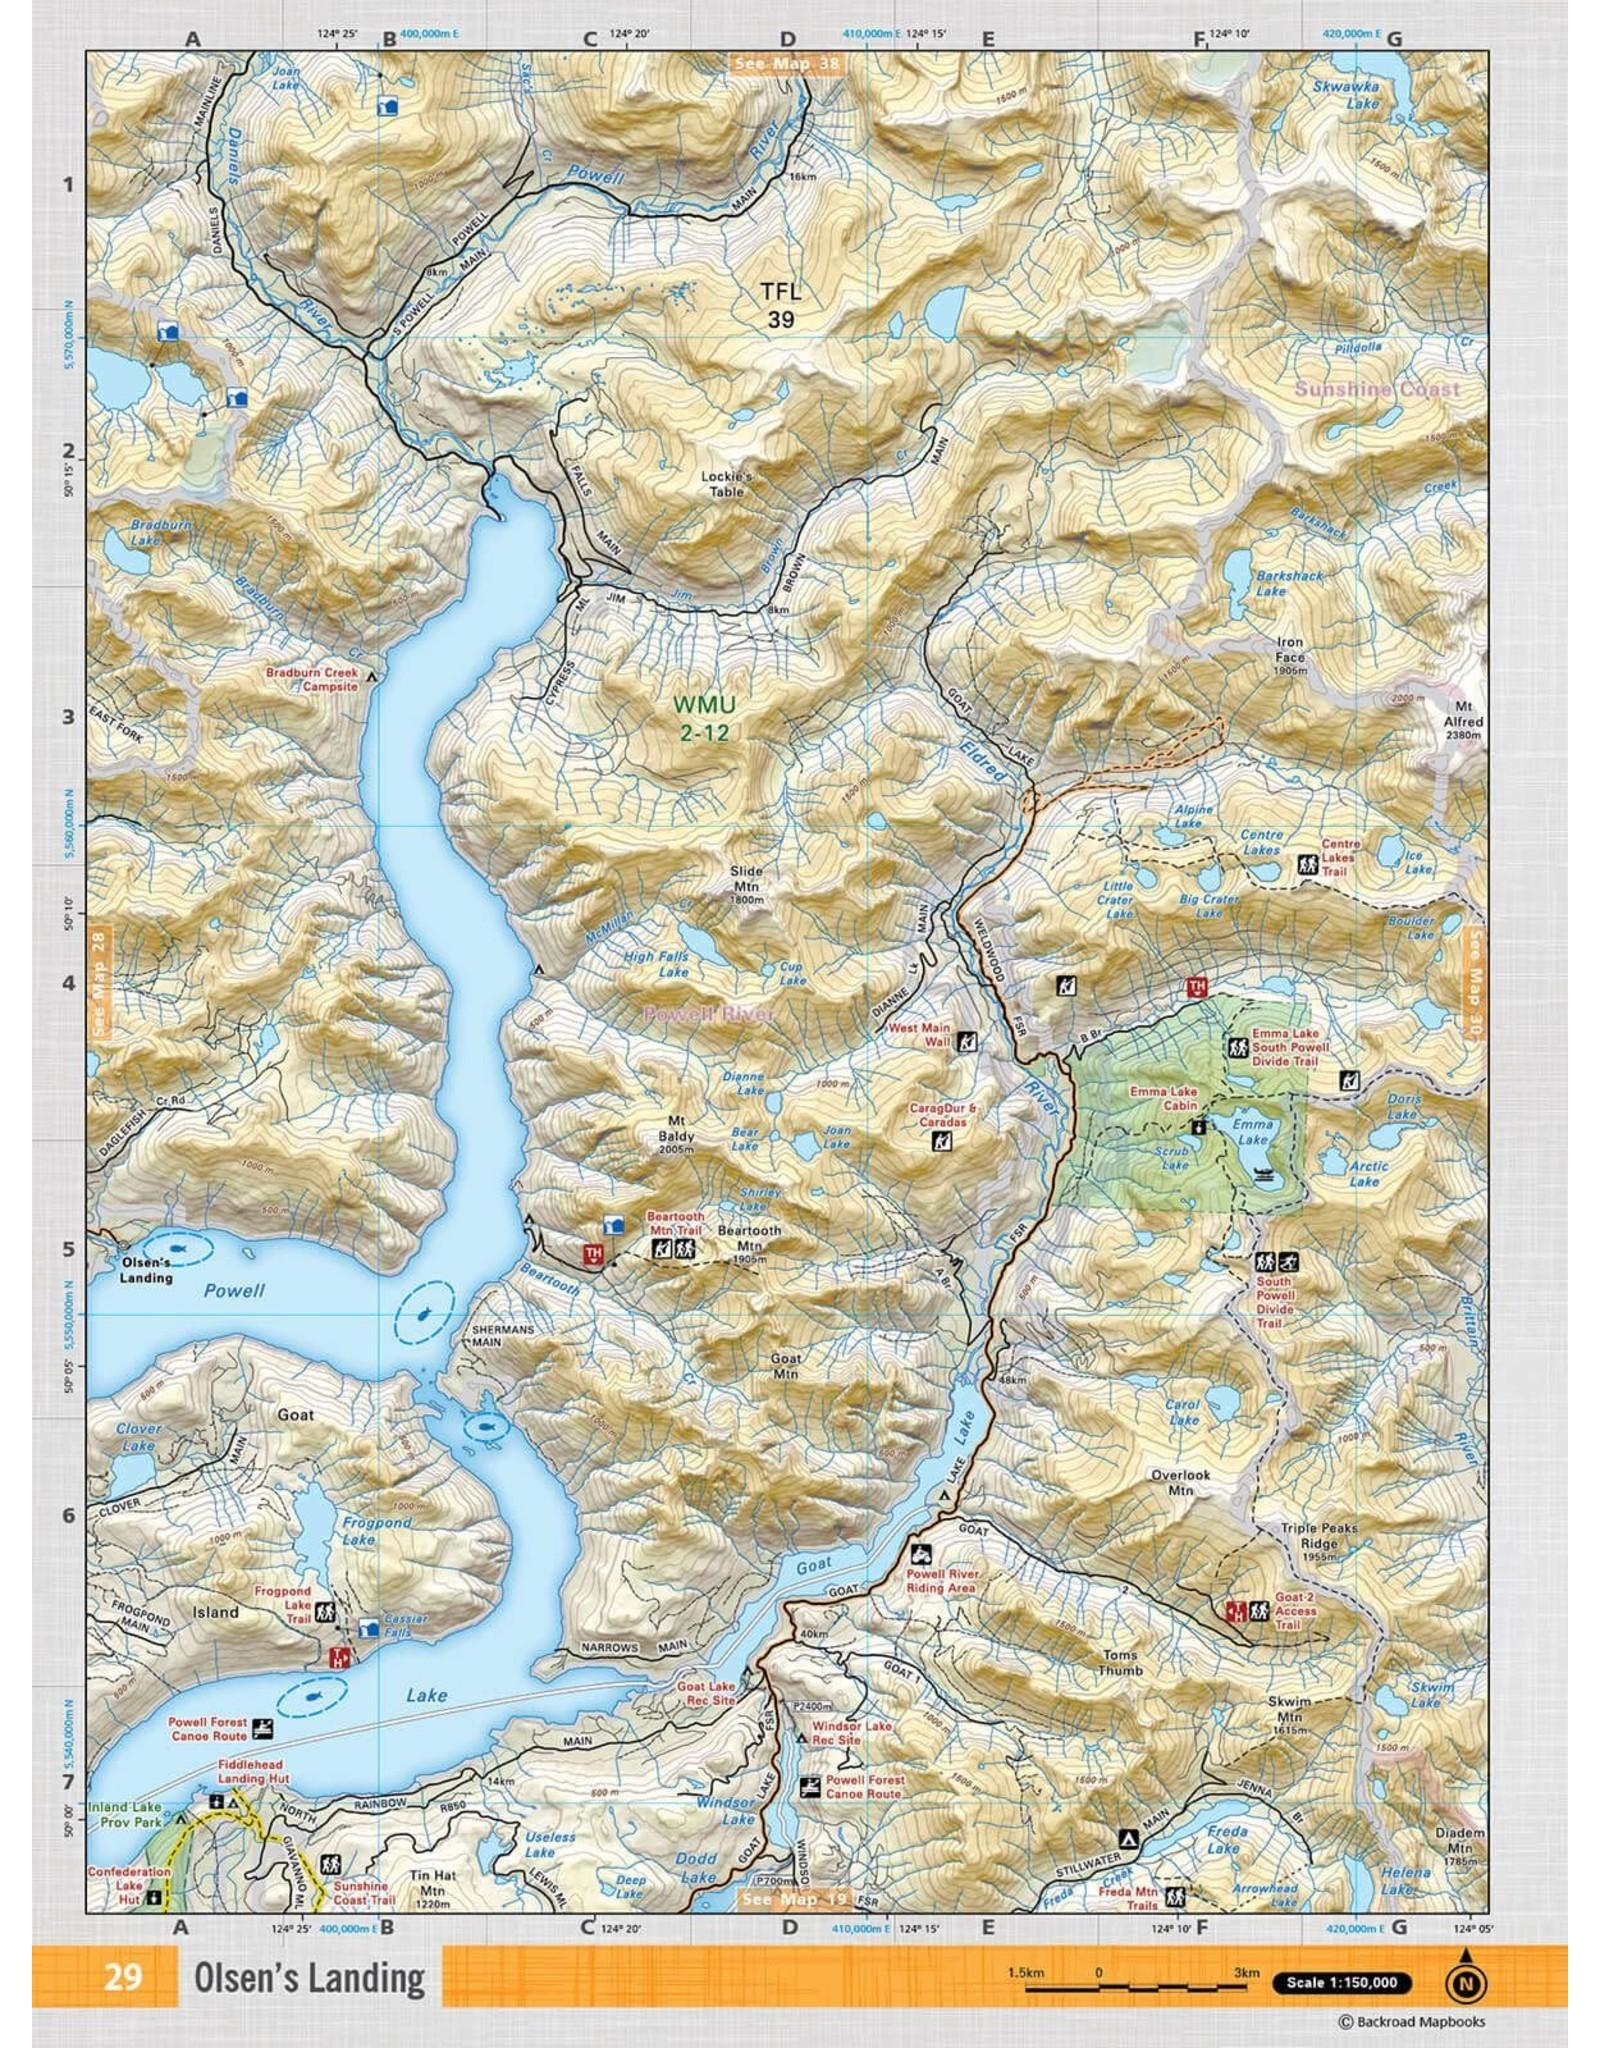 BACKROAD MAPBOOKS BRMB - VCBC29 - OLSENS LANDING